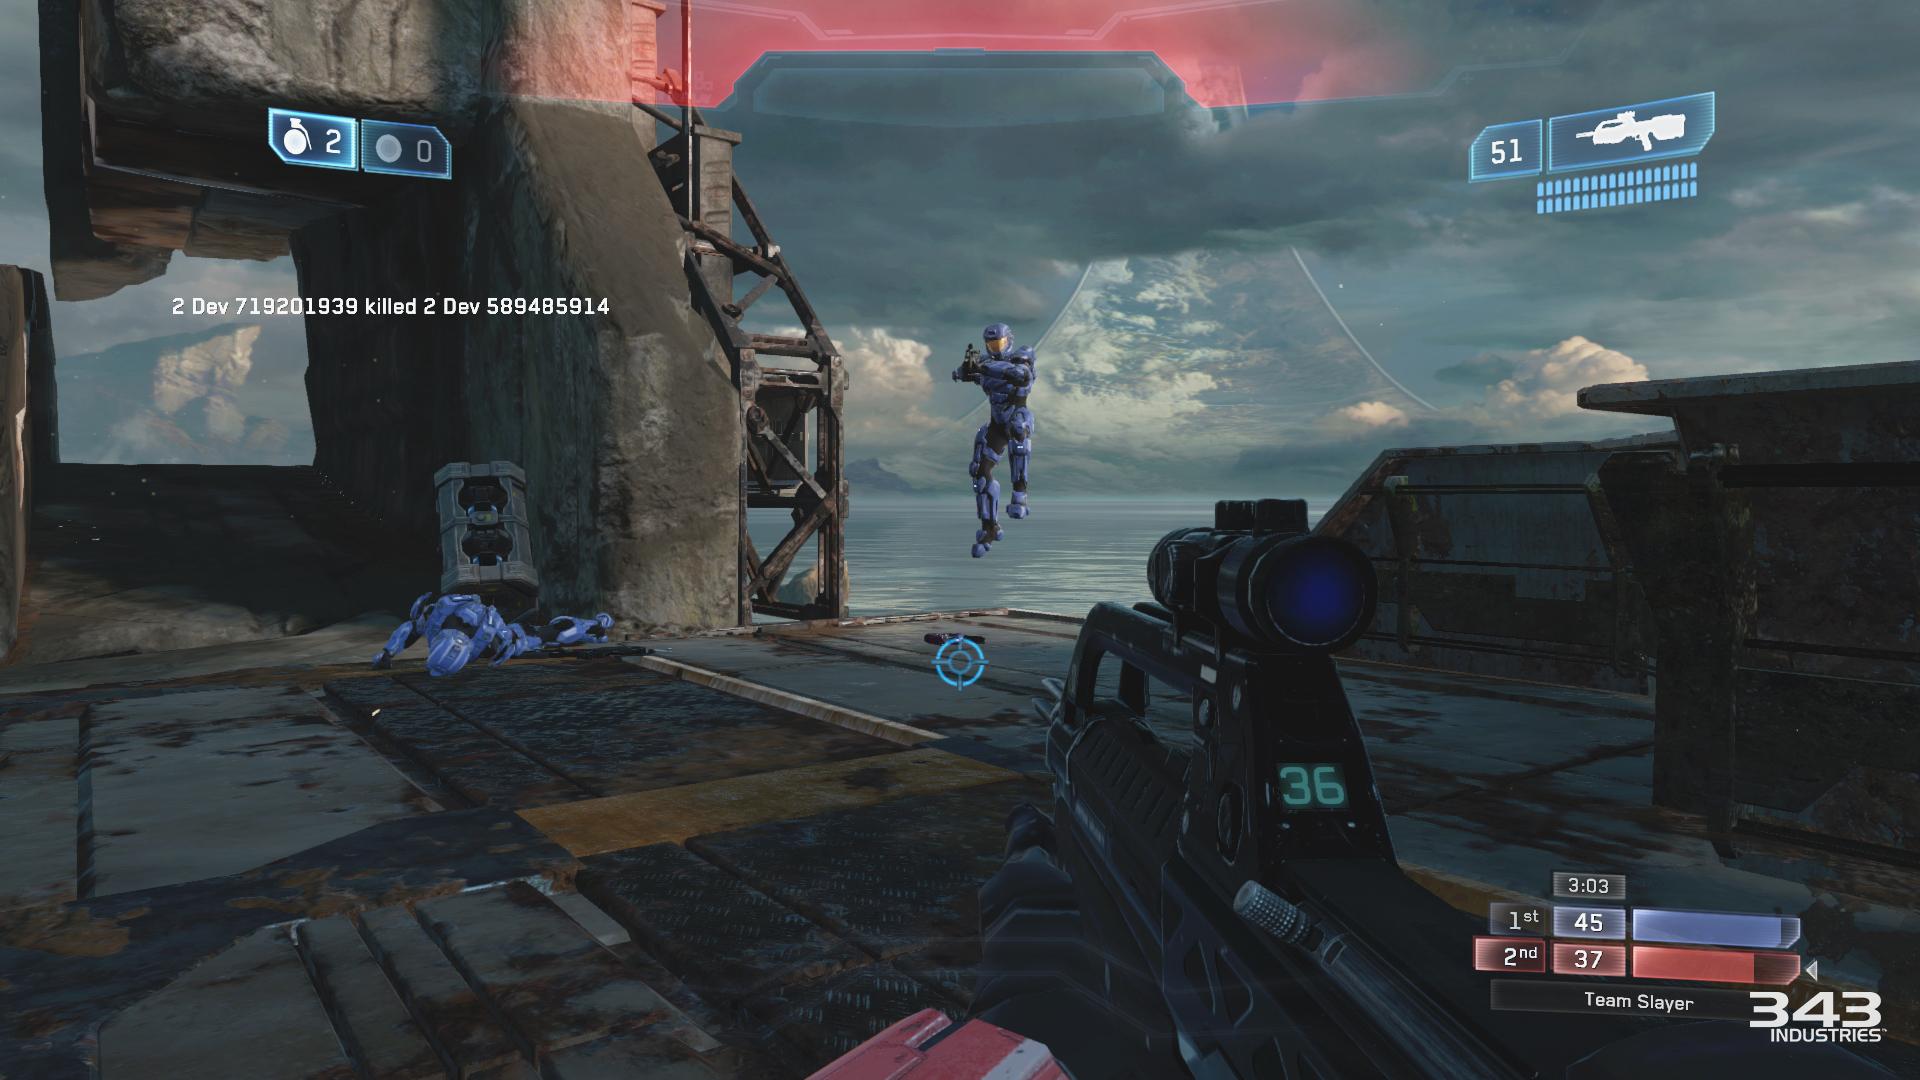 Vyšla kampaň Halo 3: ODST do Halo: The Master Chief Collection 109413